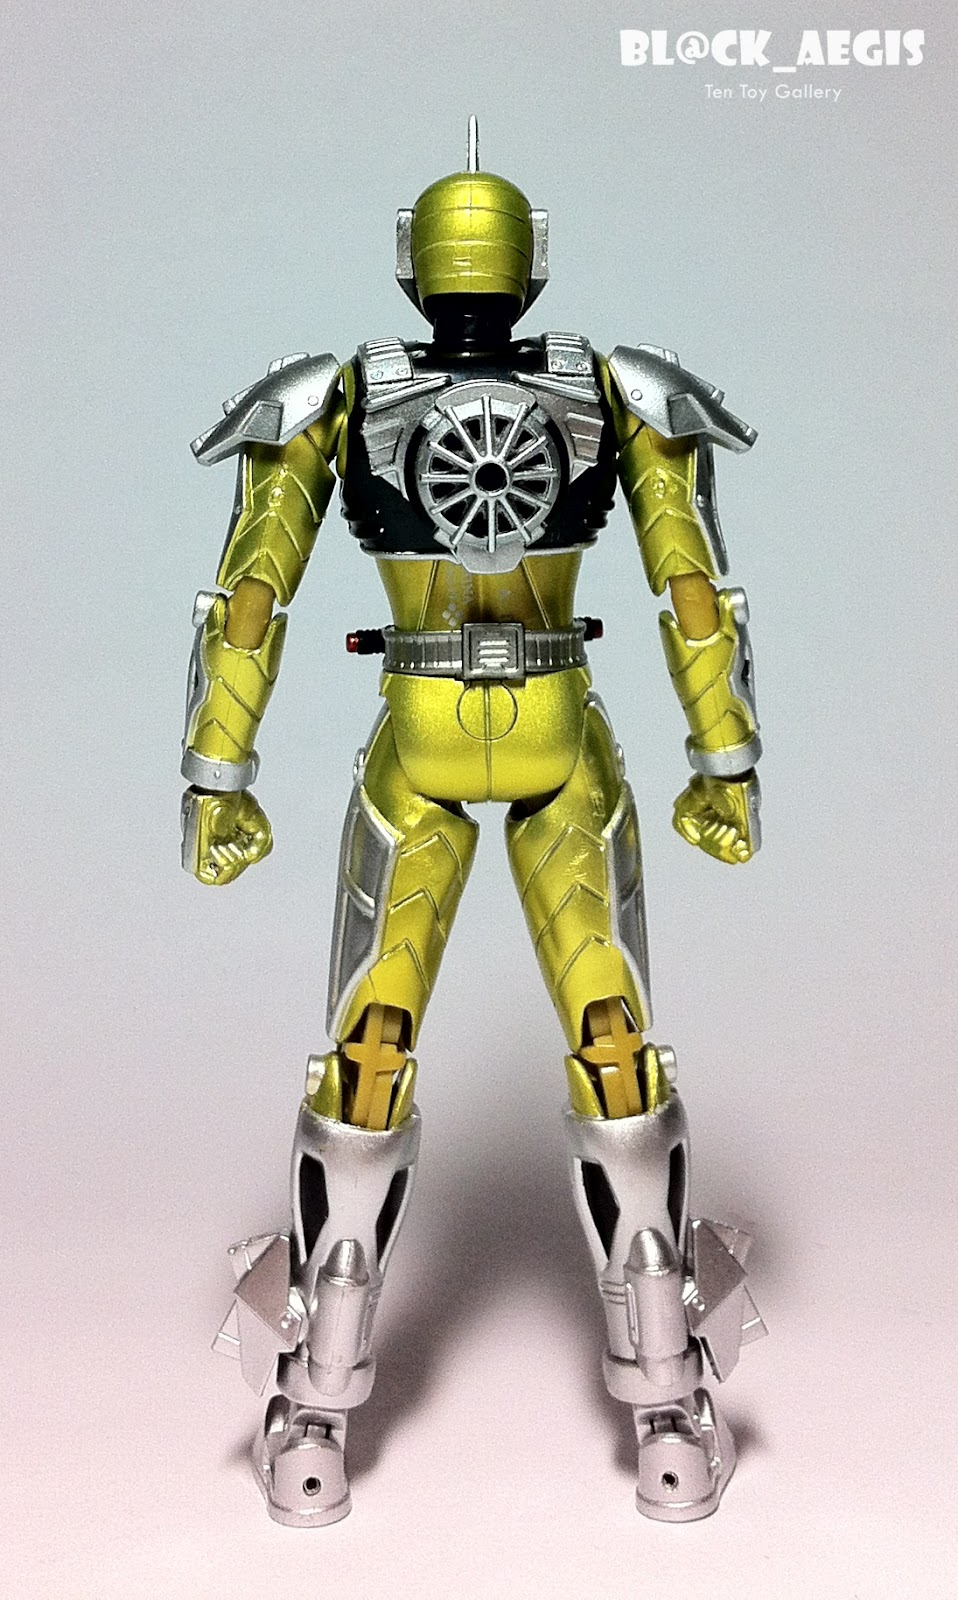 kamen rider accel on Tumblr  Kamen Rider Accel